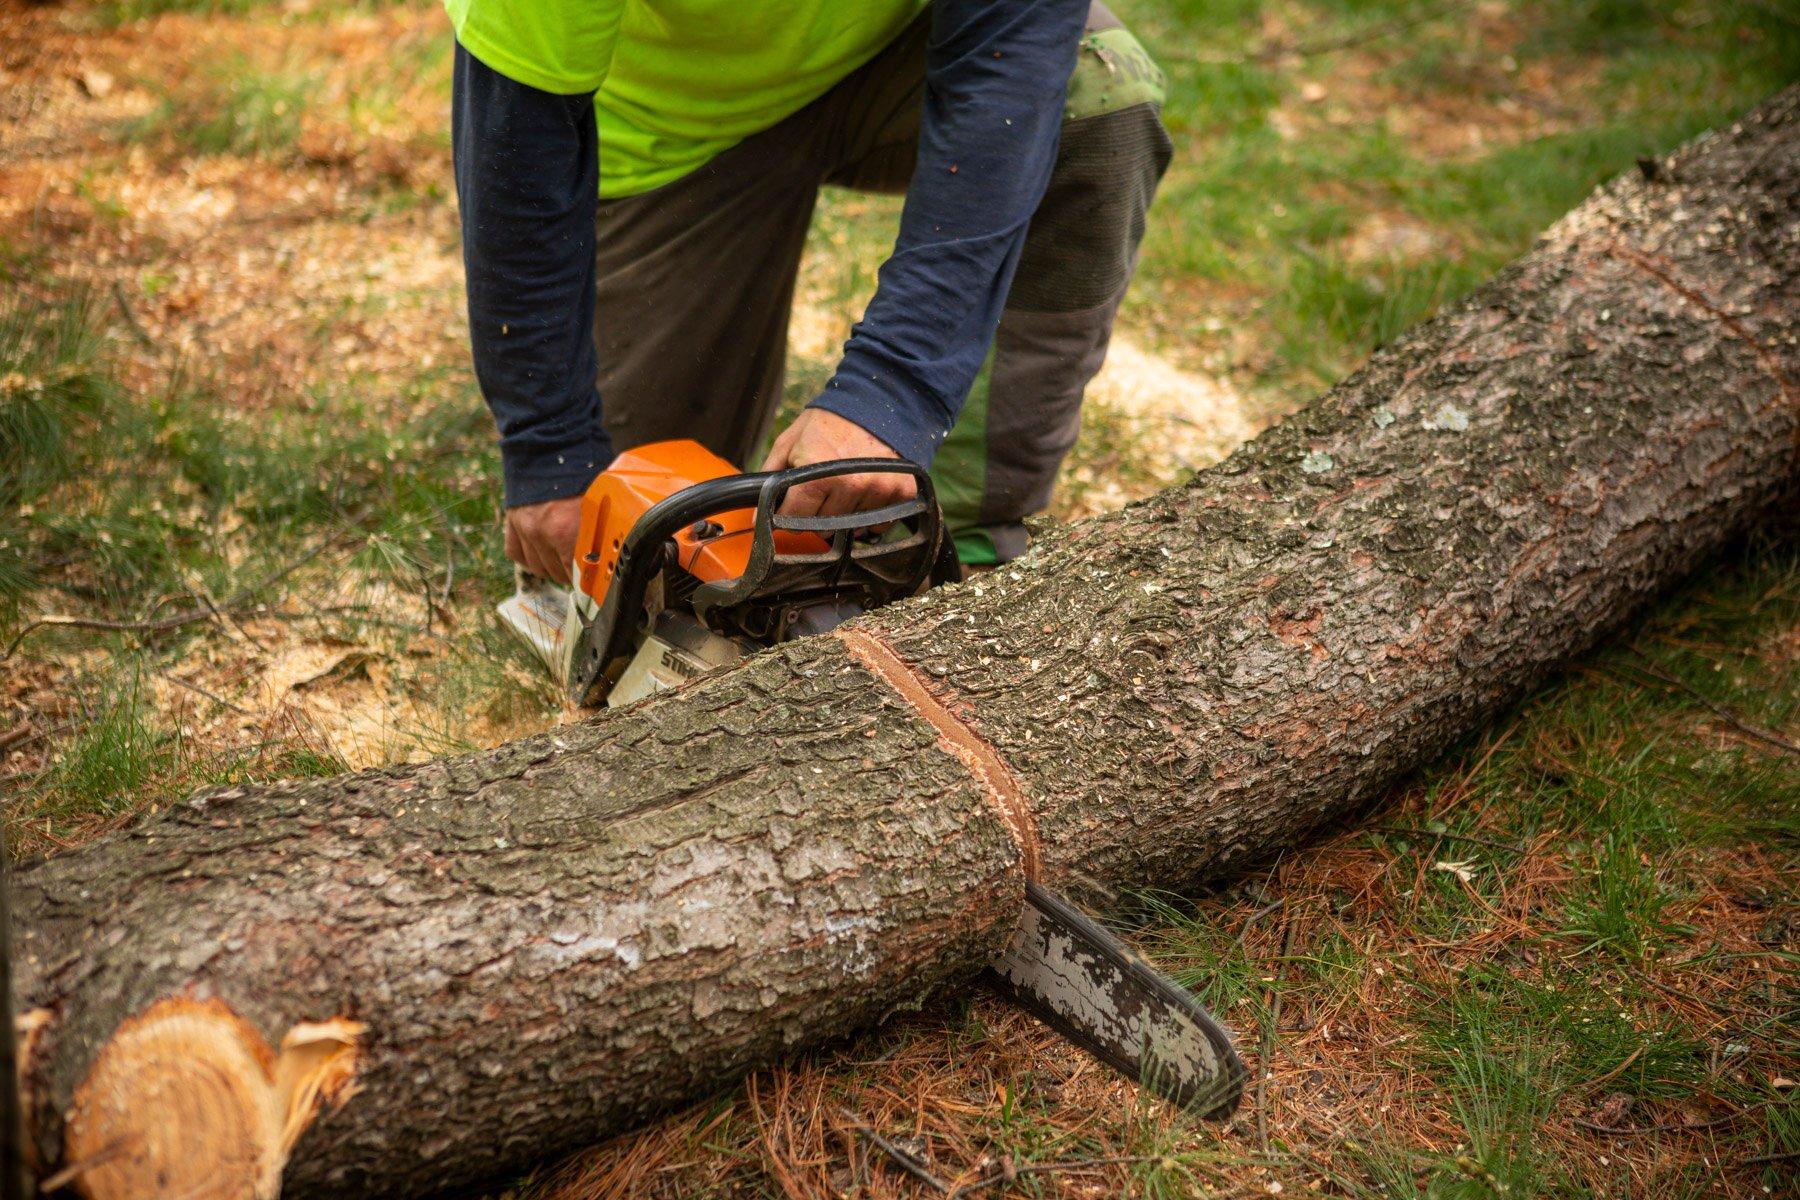 Chainsaw training for arborist